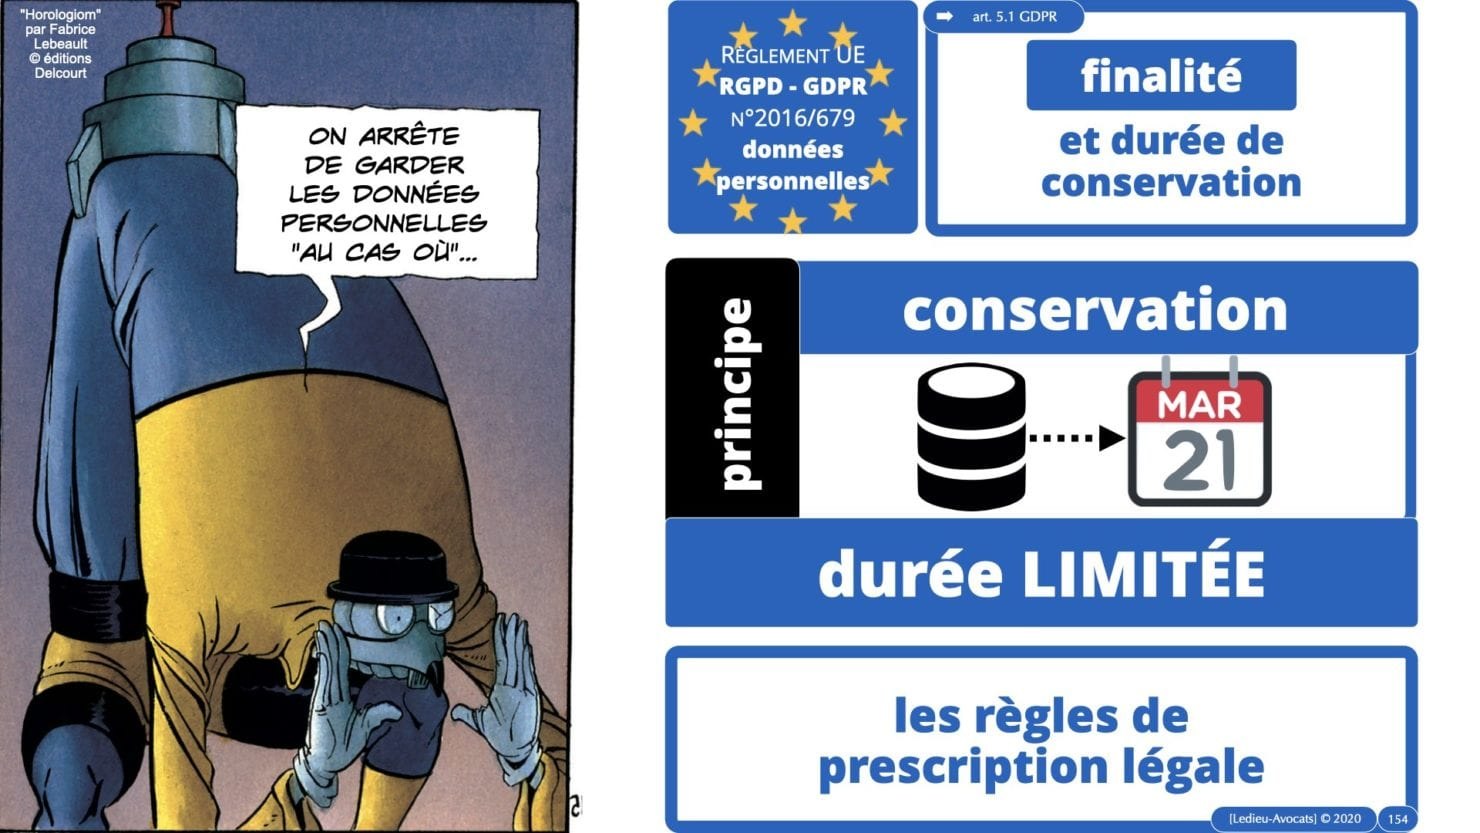 RGPD e-Privacy principes actualité jurisprudence ©Ledieu-Avocats 25-06-2021.154